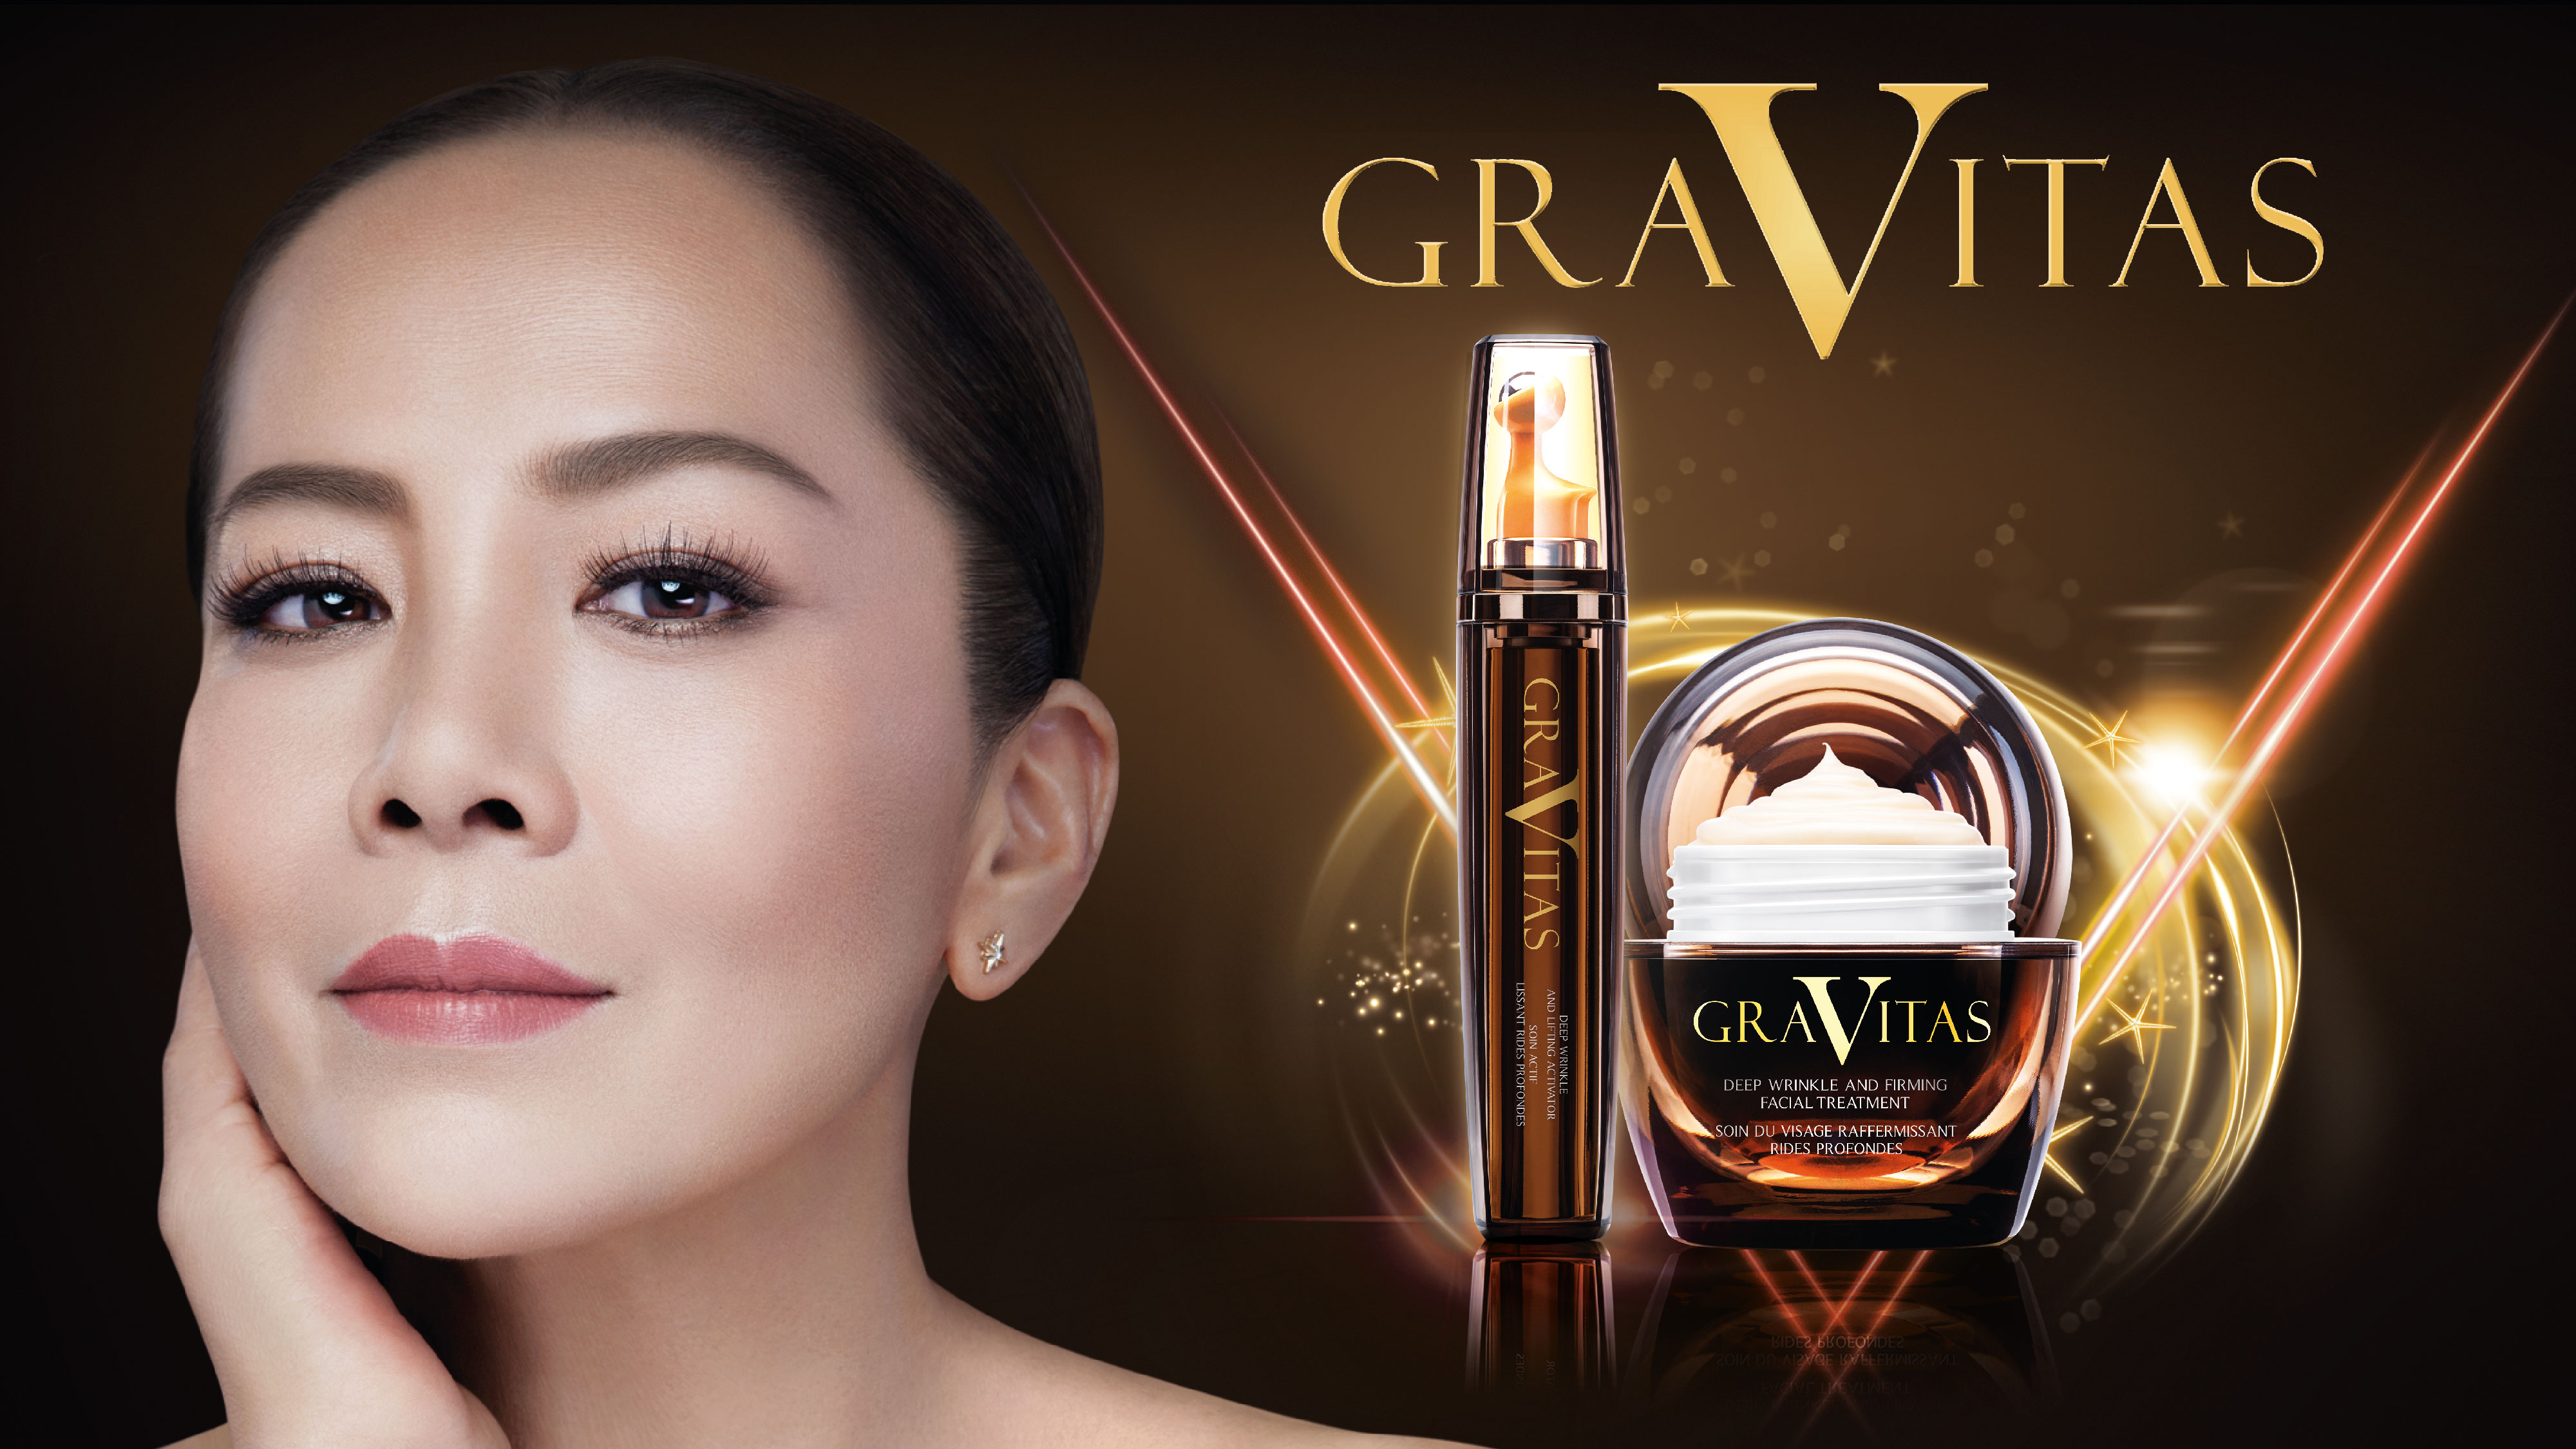 AW Gravitas Model + BG 02